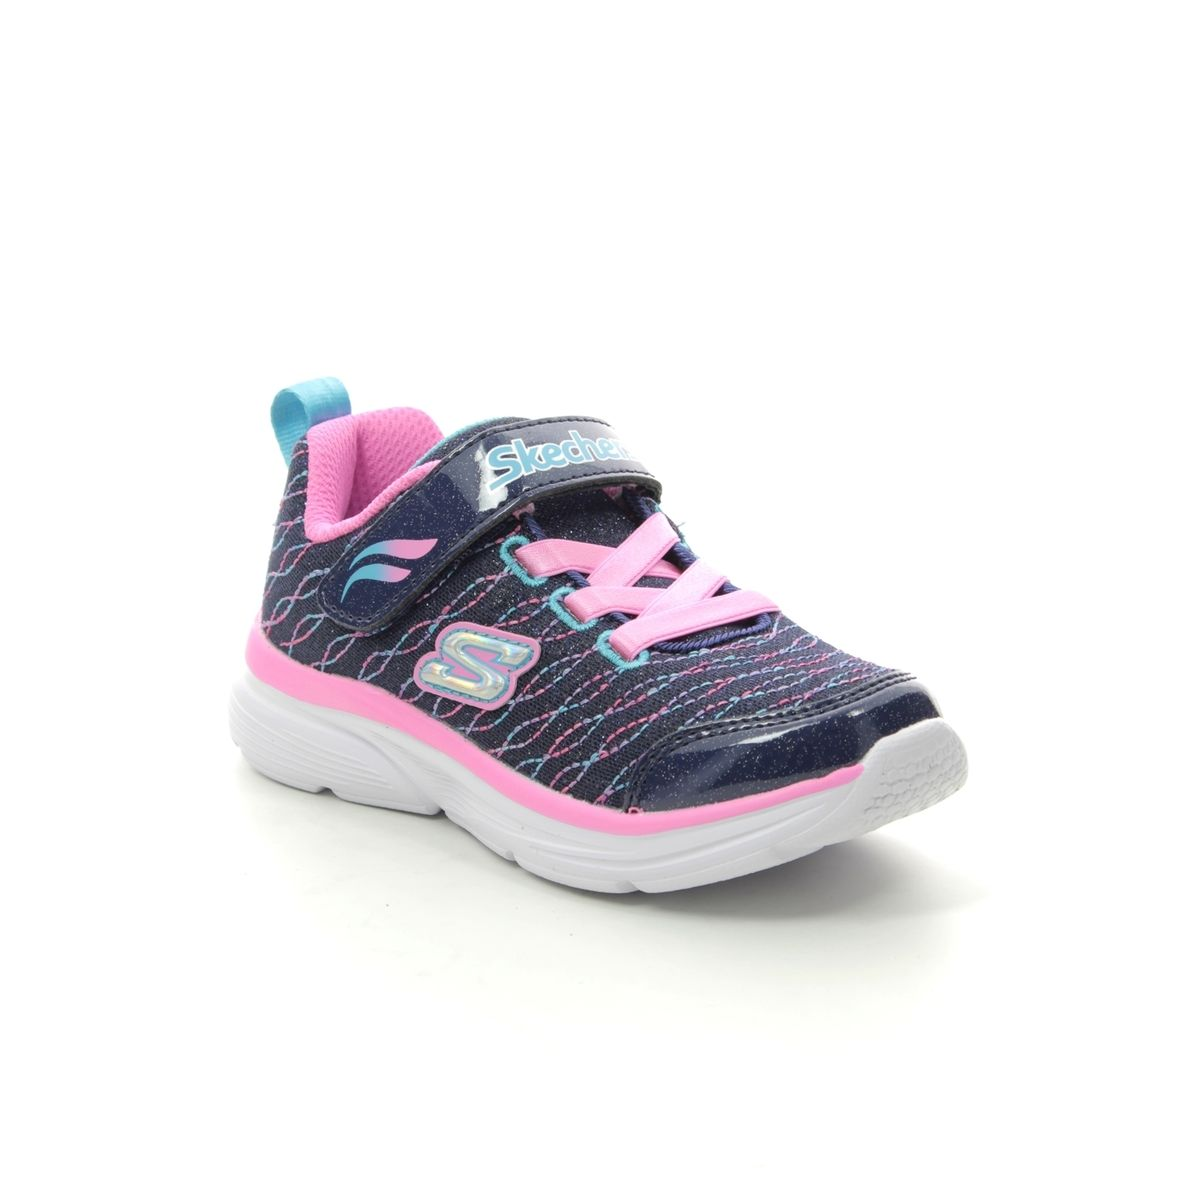 Skechers Skechers girls shoes mesh fabric Velcro sports casual shoes 82064